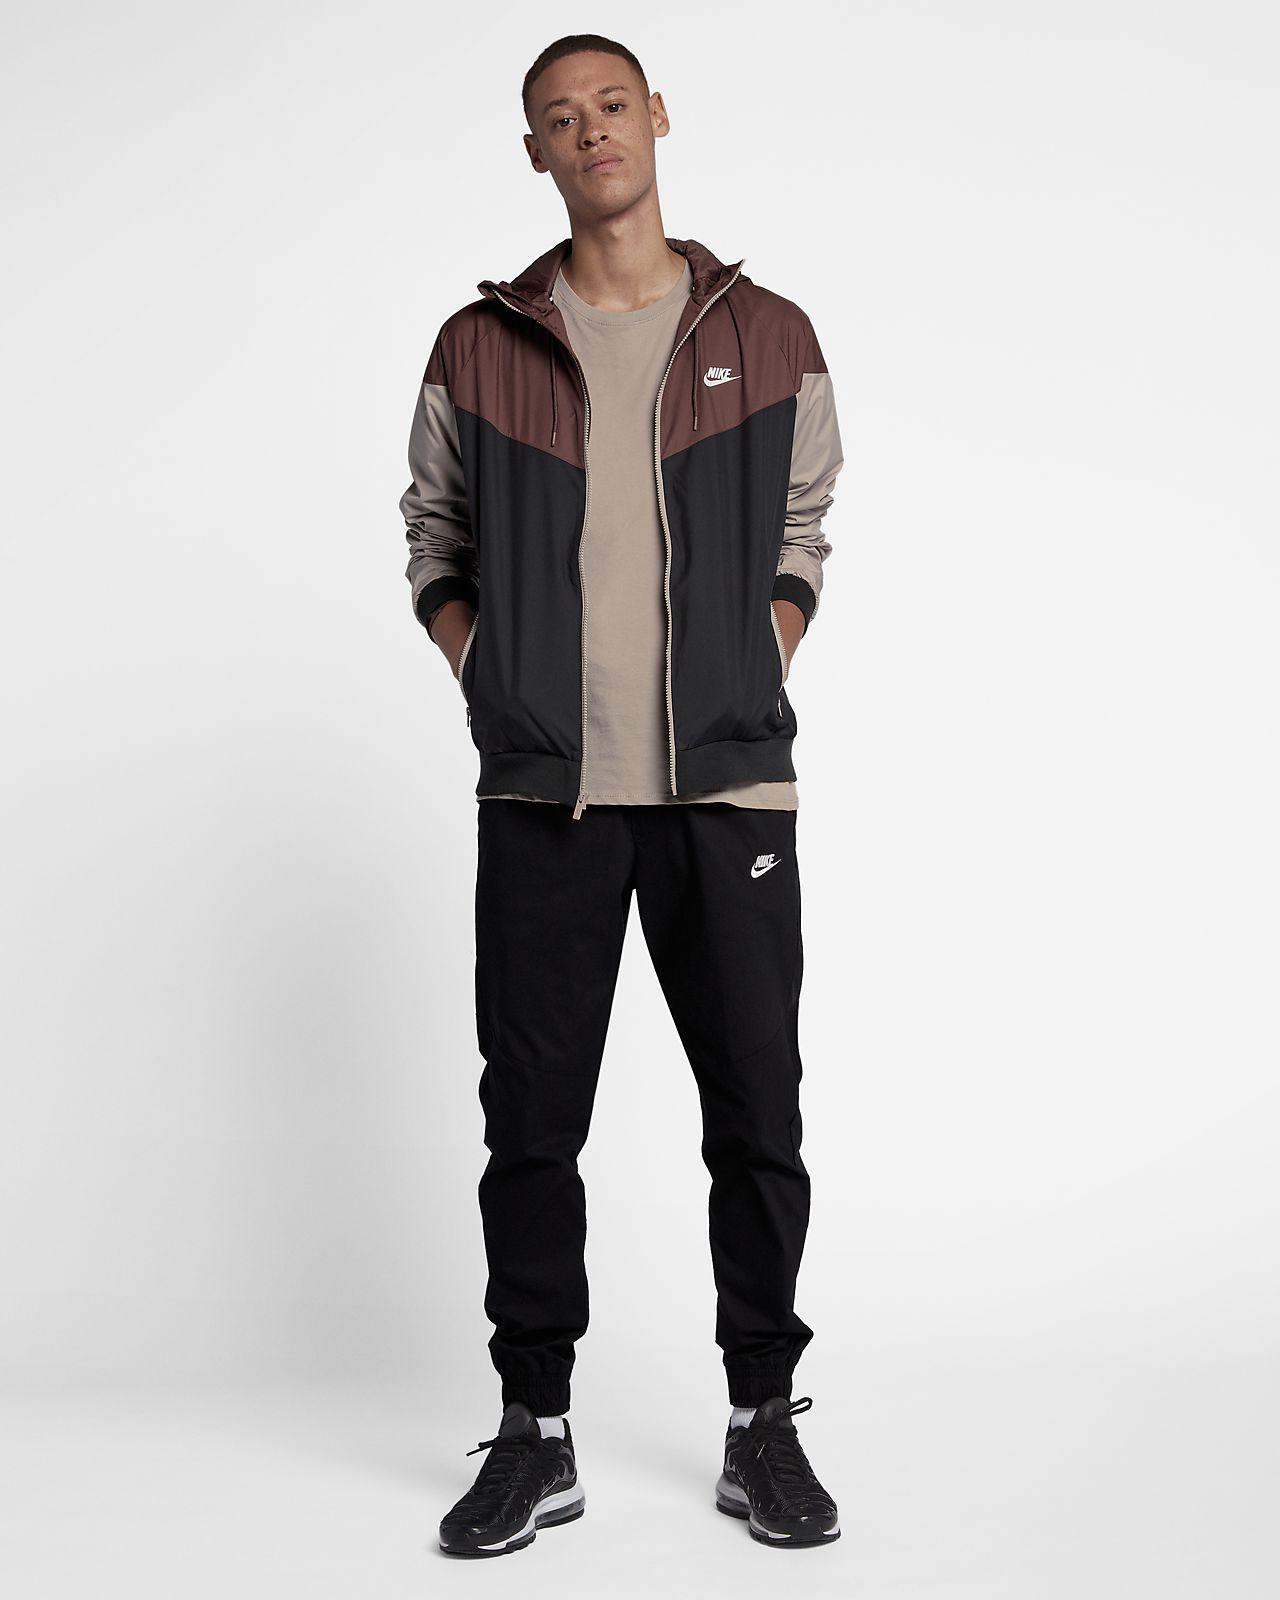 bb1eb04a96 Low Resolution Nike Sportswear Windrunner Men s Jacket Nike Sportswear  Windrunner Men s Jacket